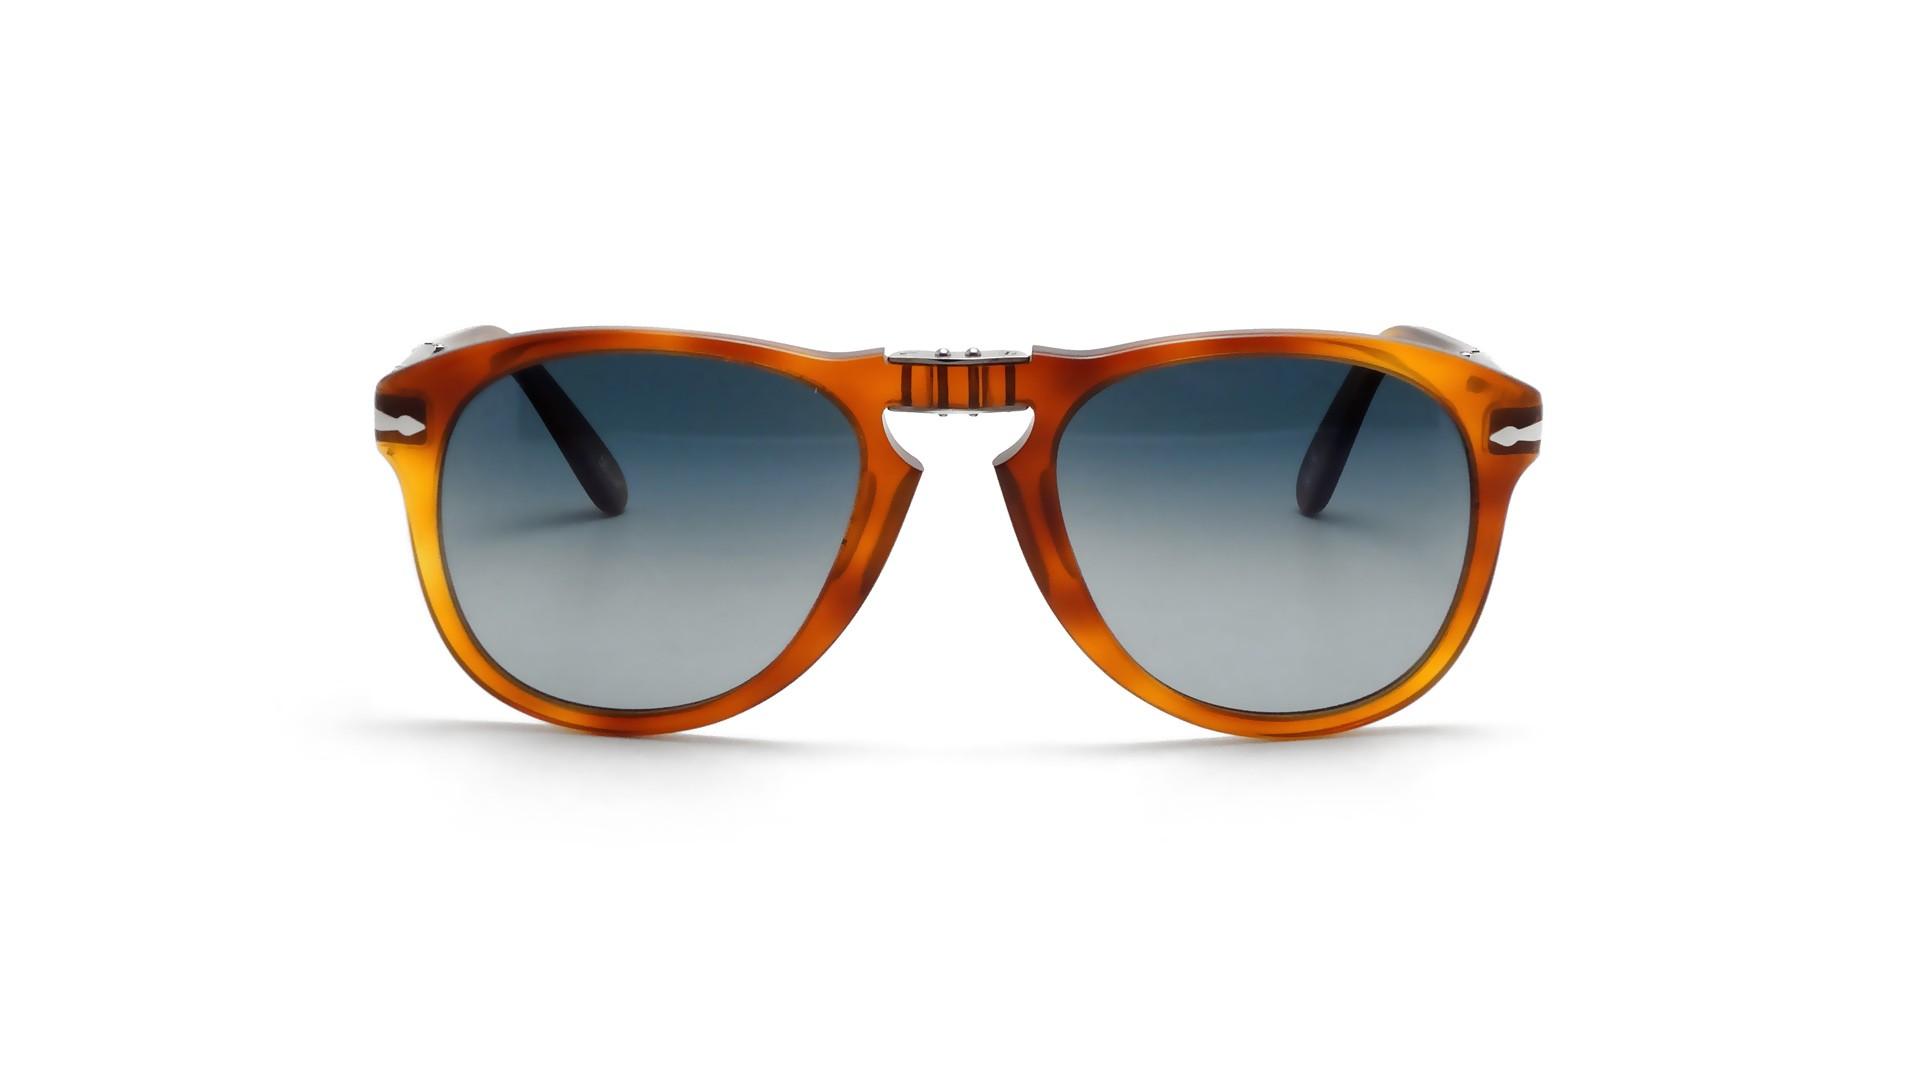 Sunglasses Persol Steve McQueen Havane Tortoise PO0714SM 96S3 54-21 Large  Polarized Gradient fd8f2feed3d2